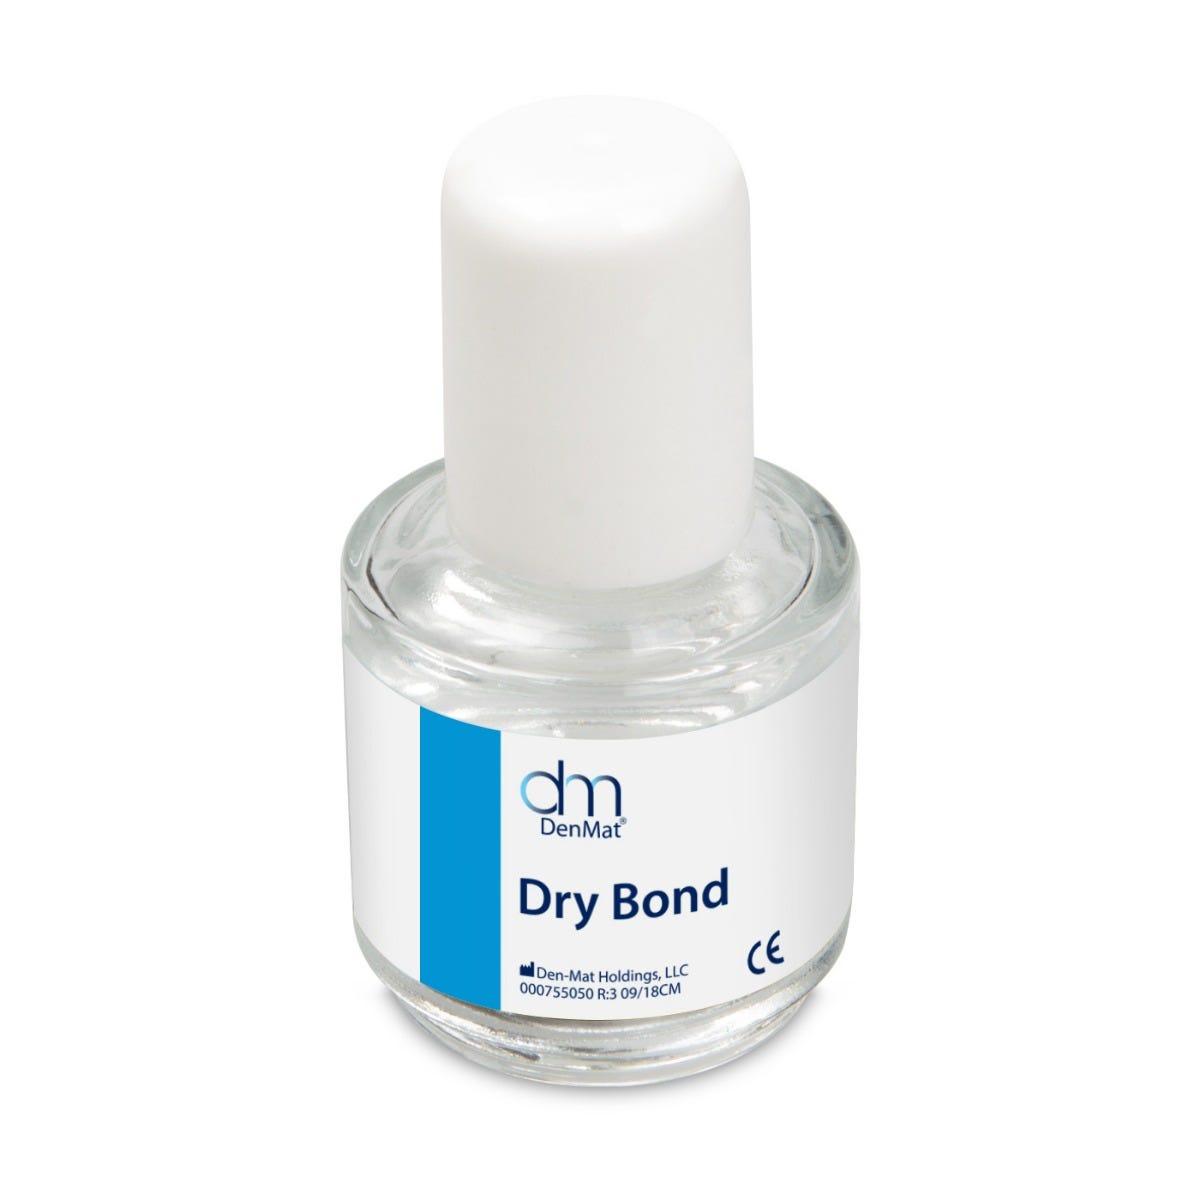 Dental Drying Agent - Dry Bond 25mL